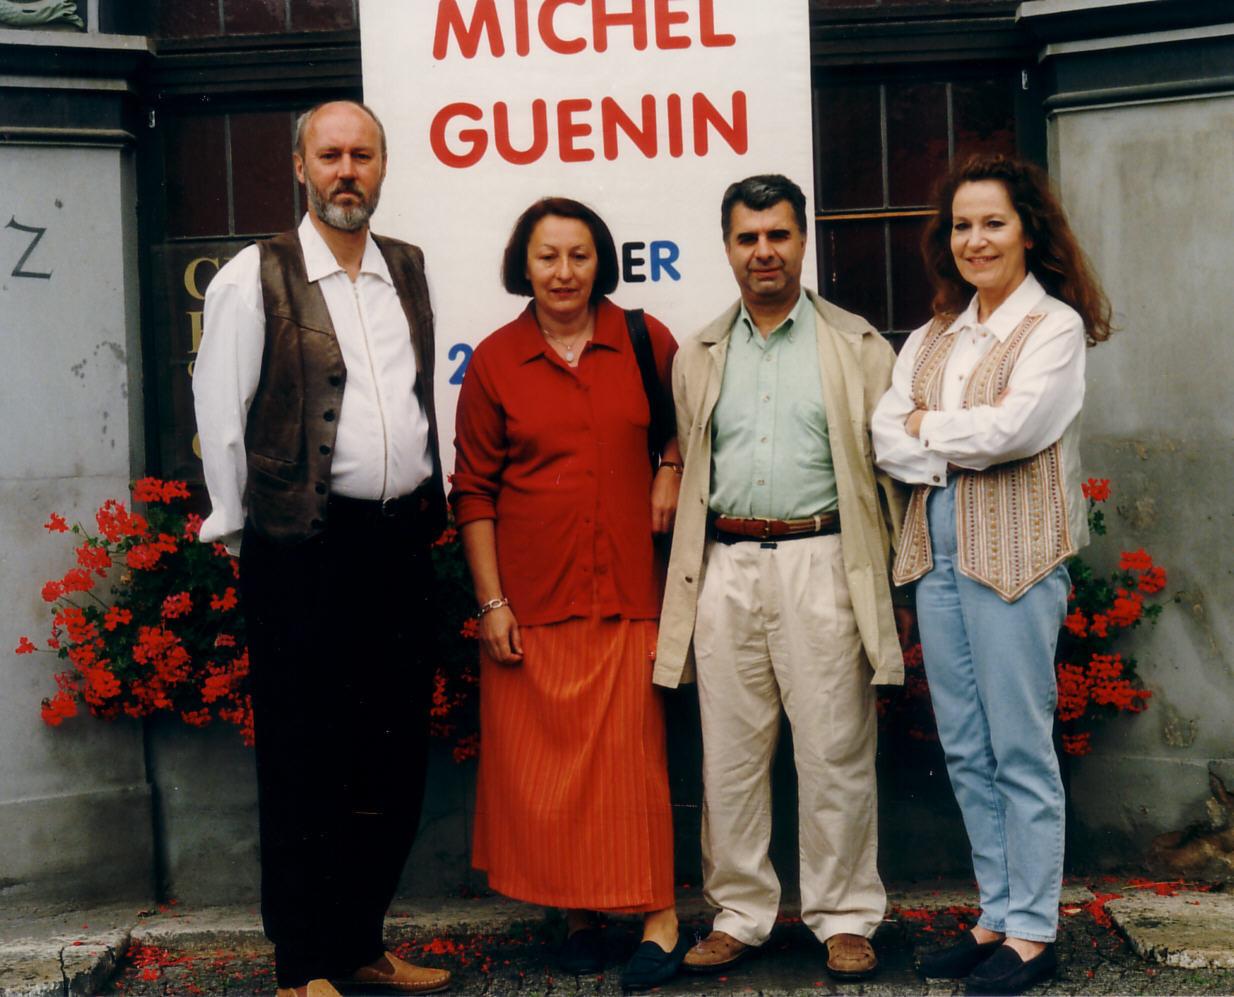 Ralph Herrmann, Claire Guinin, Jean Michel Guinin, Ulla Höpken